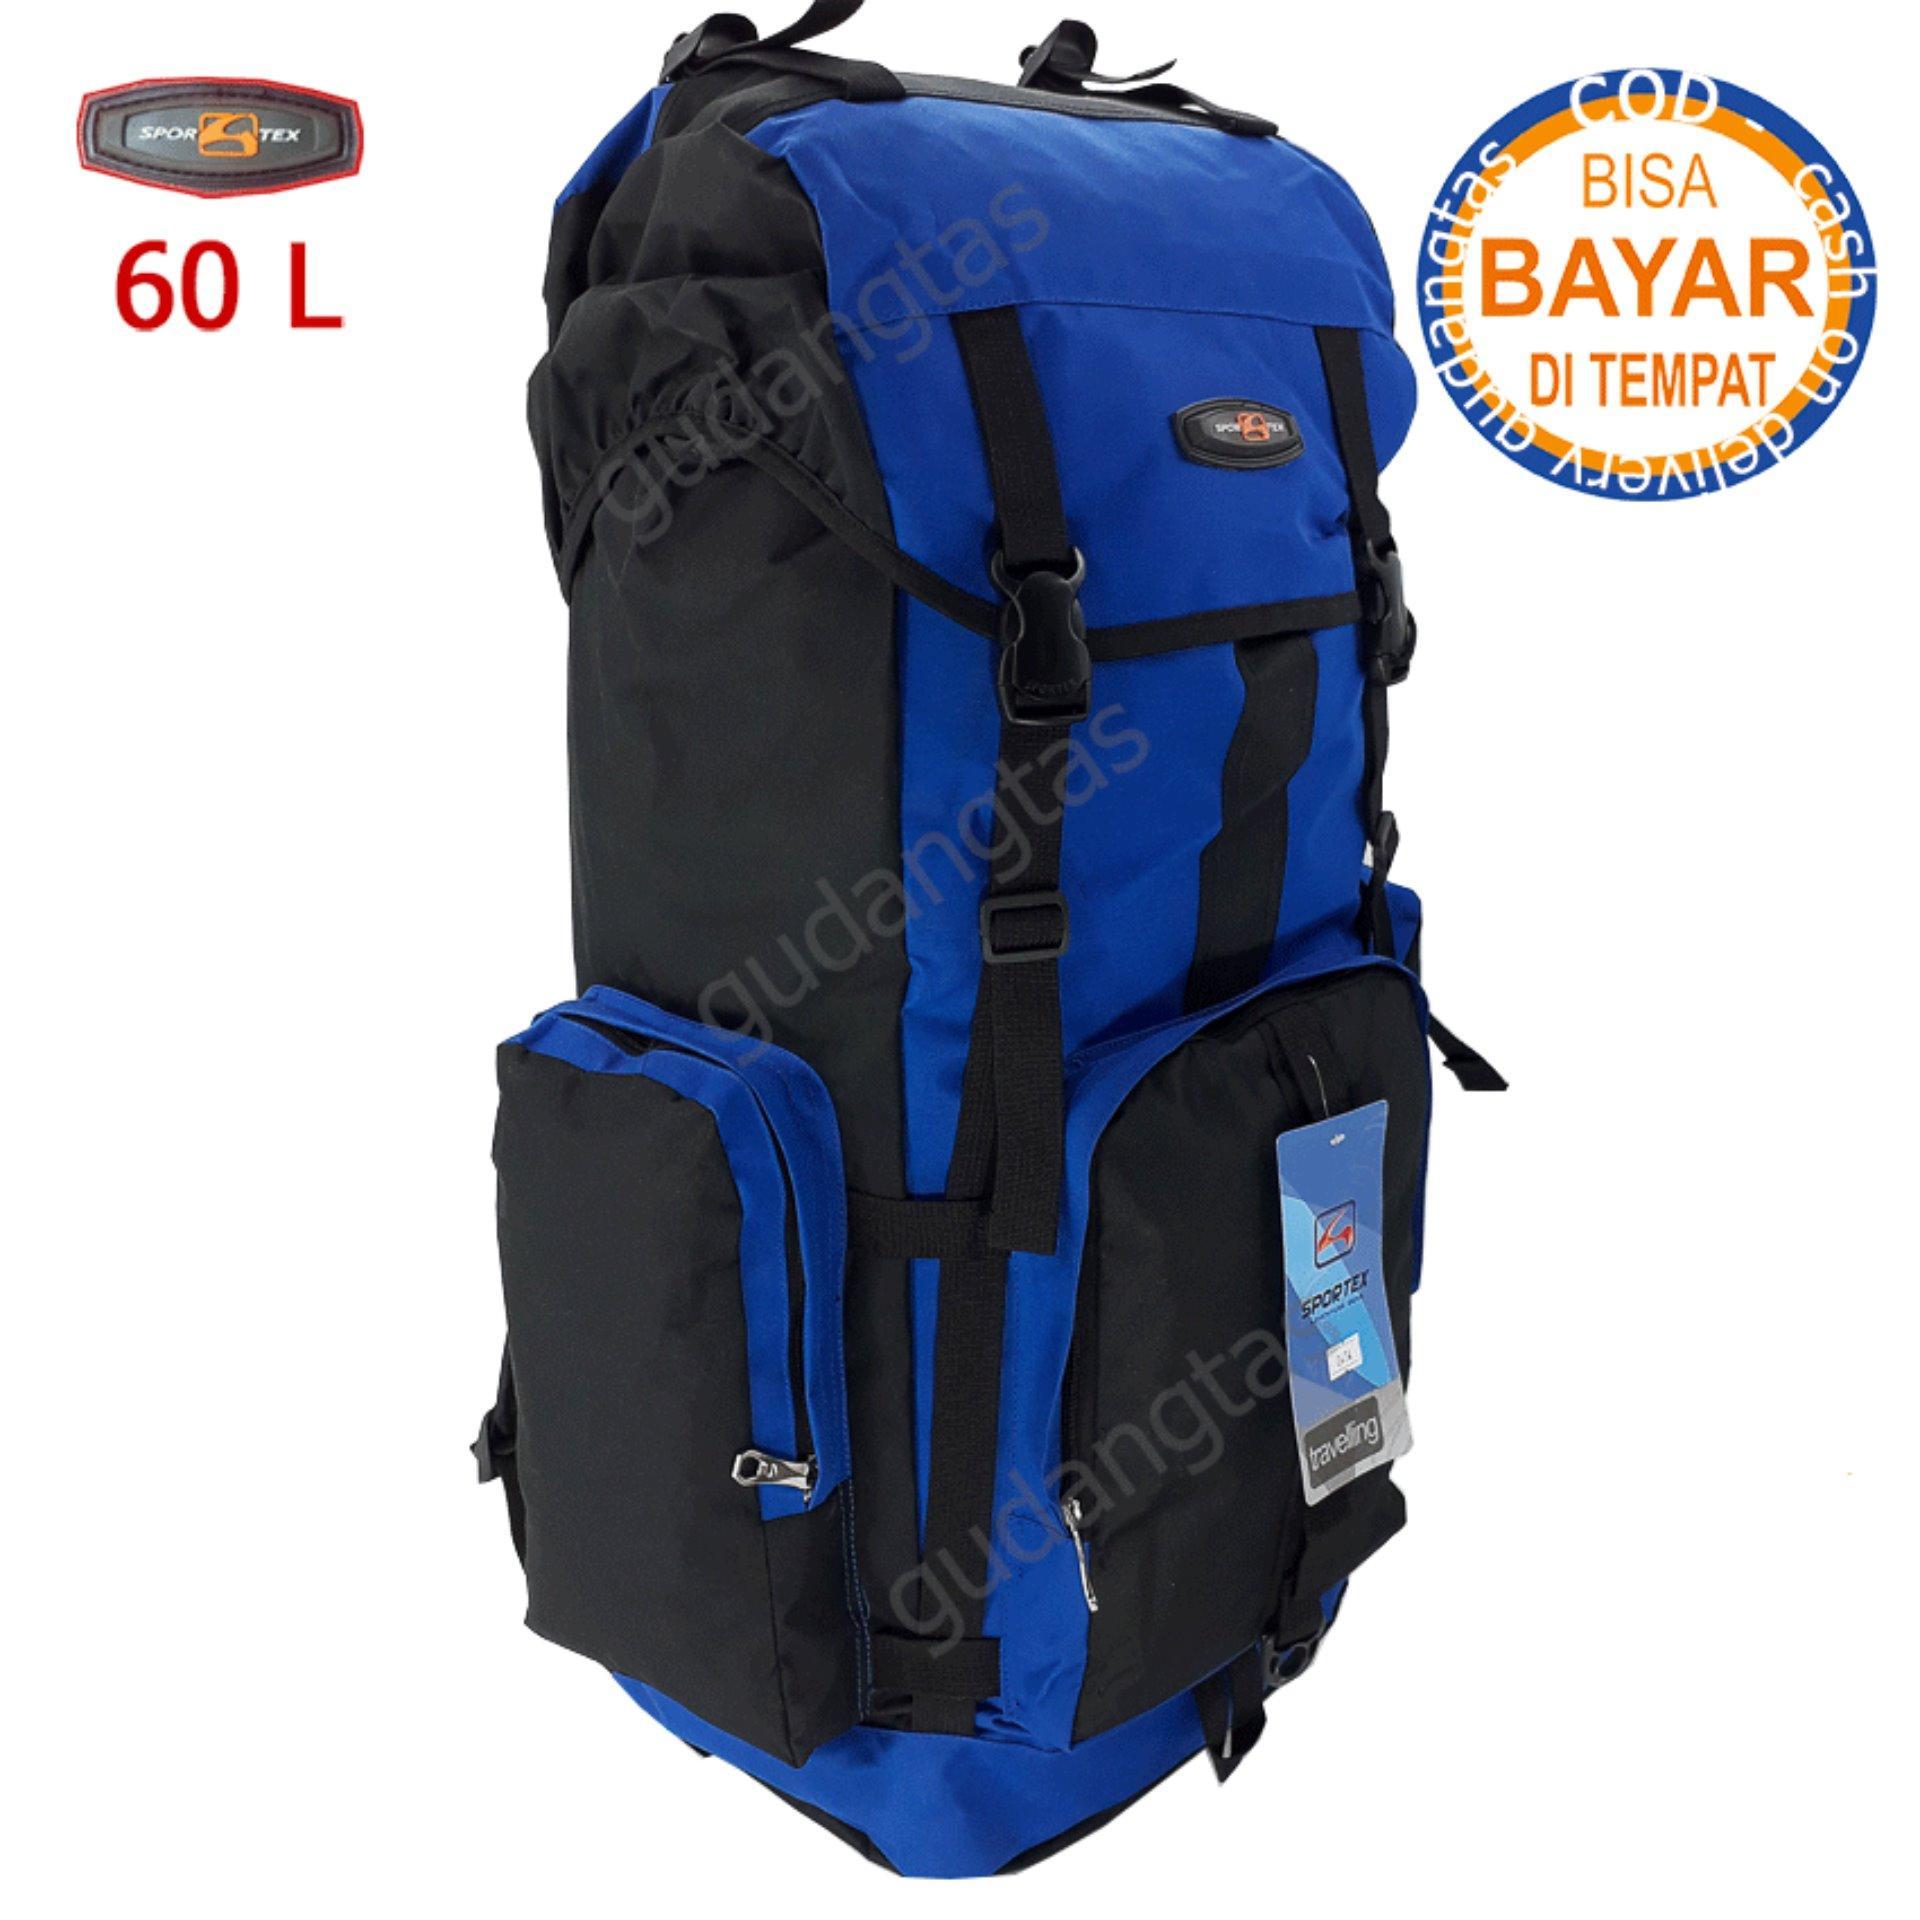 Sportex Tas Gunung Tas Keril Tas Carrier Ransel Camping Tas Hiking 60L 04W4  Biru Terang kombinasi fd5408dcab